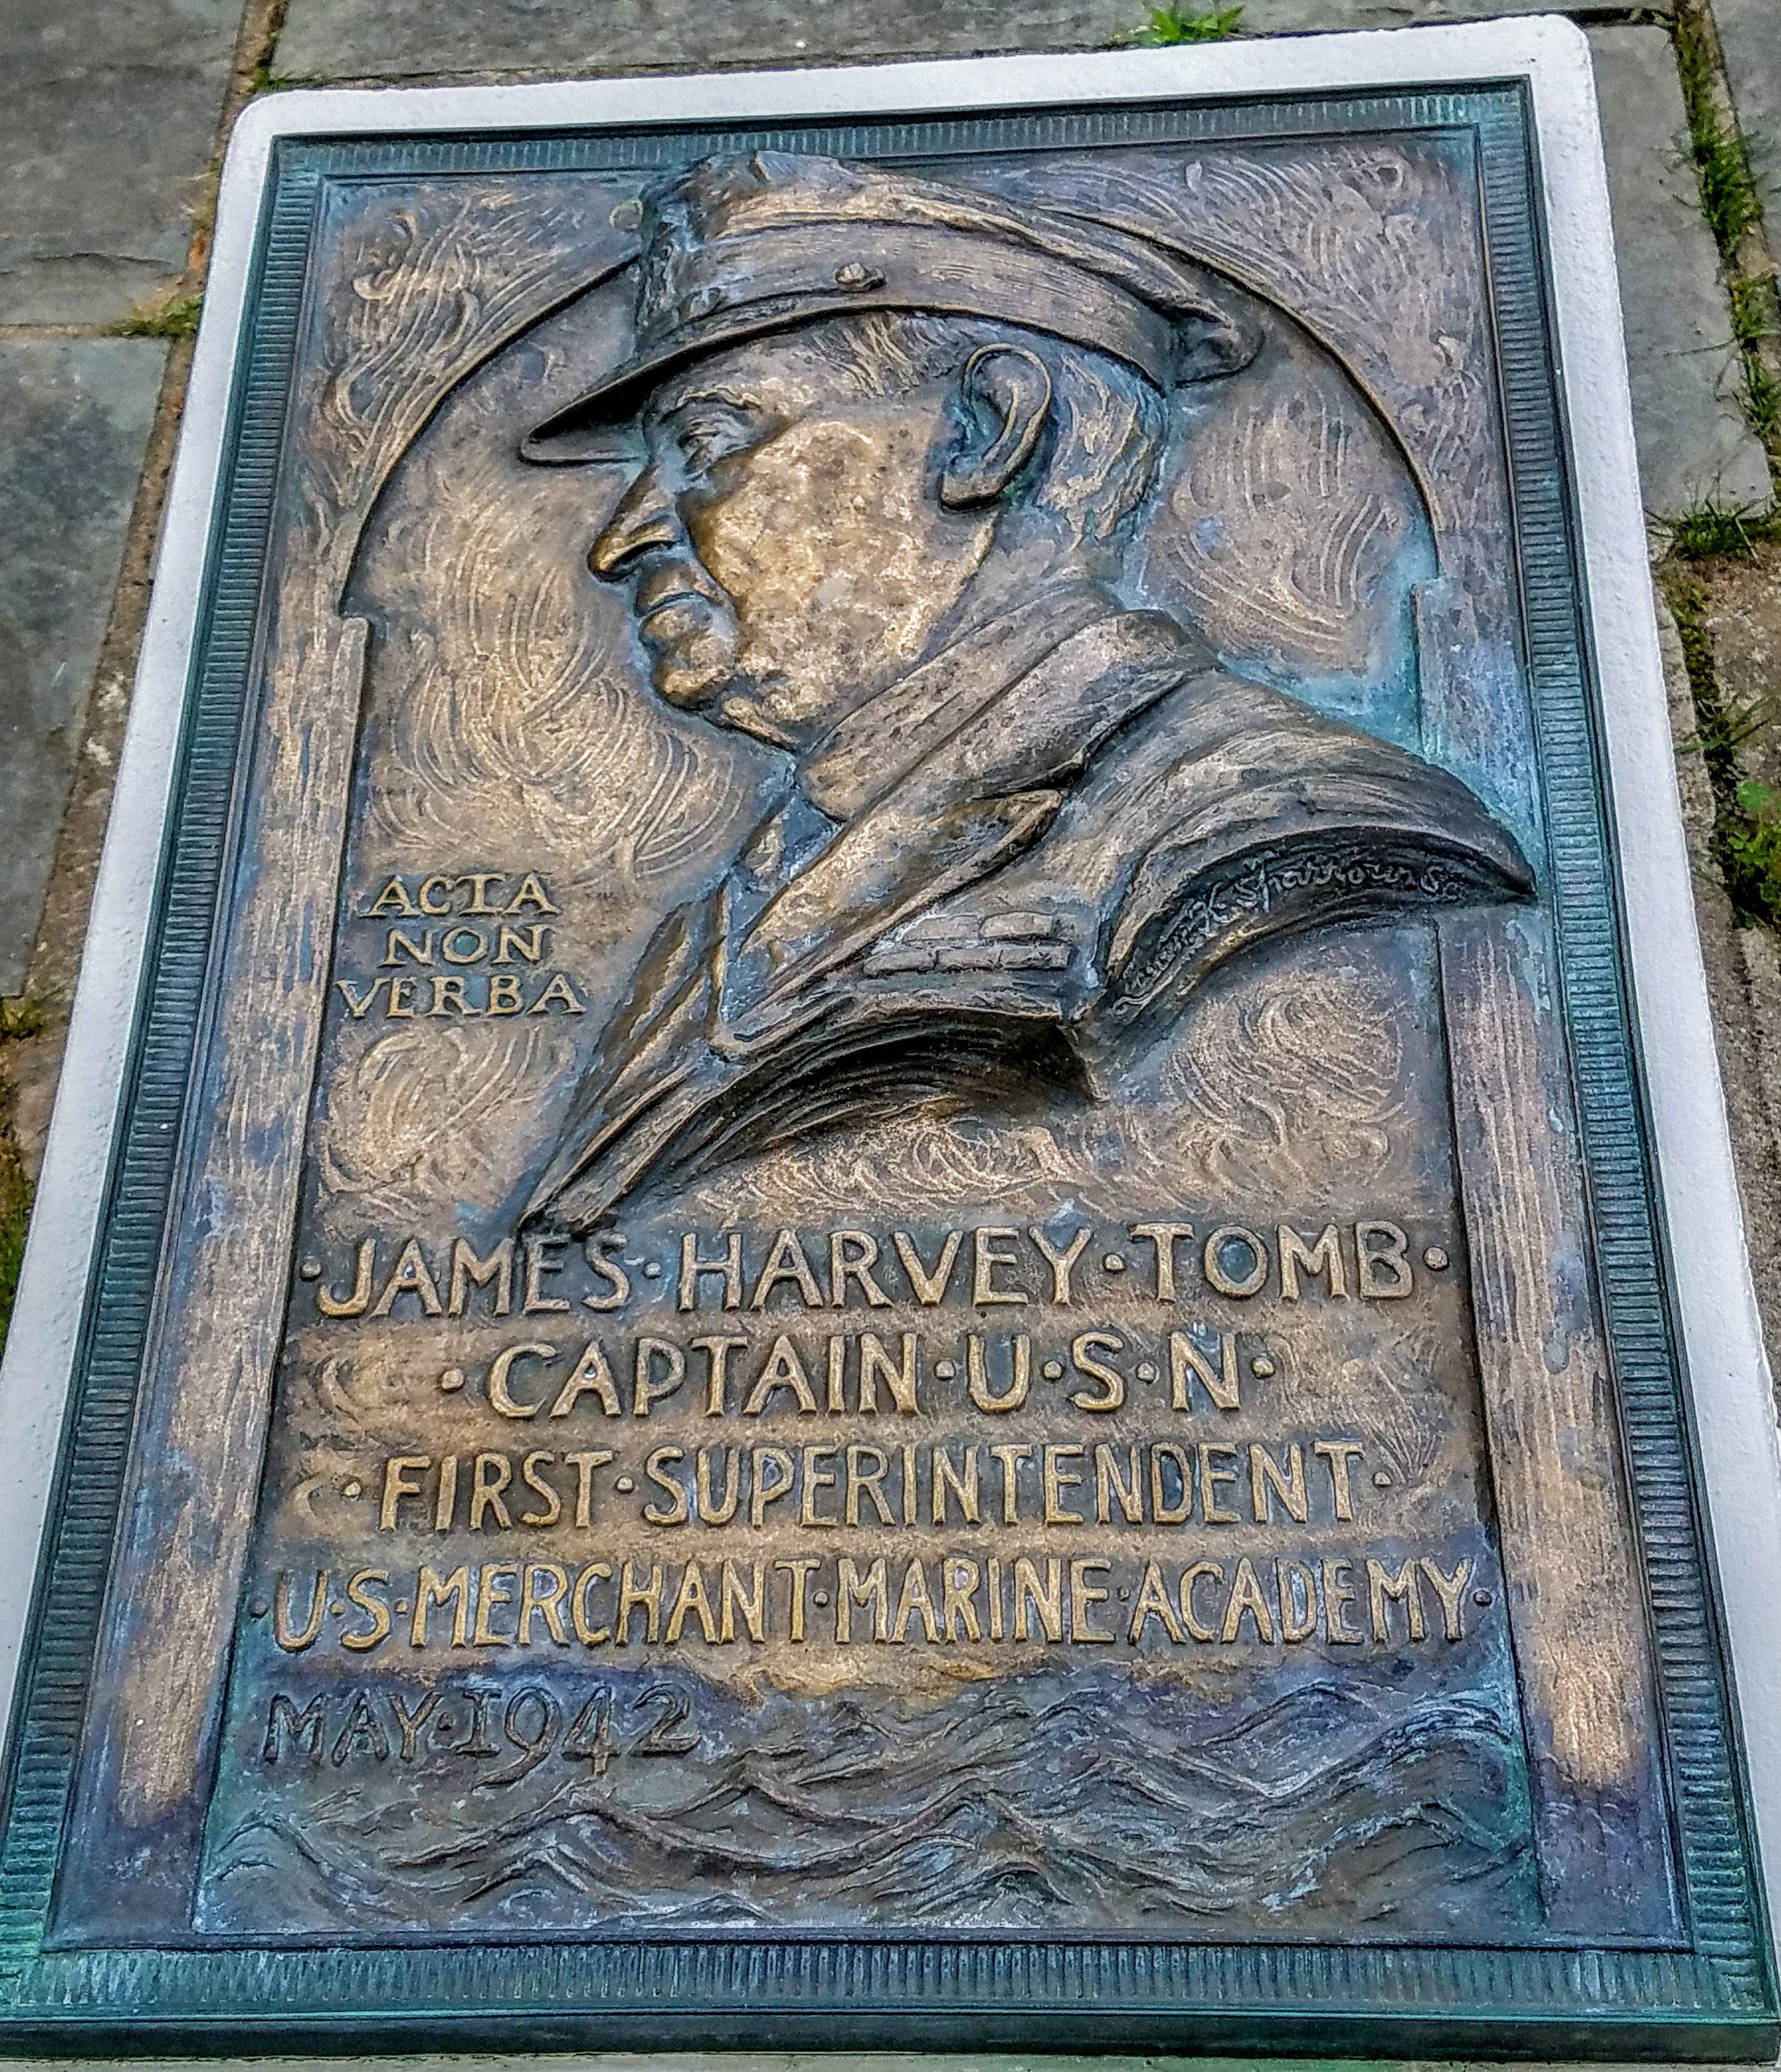 The James Harvey Tomb